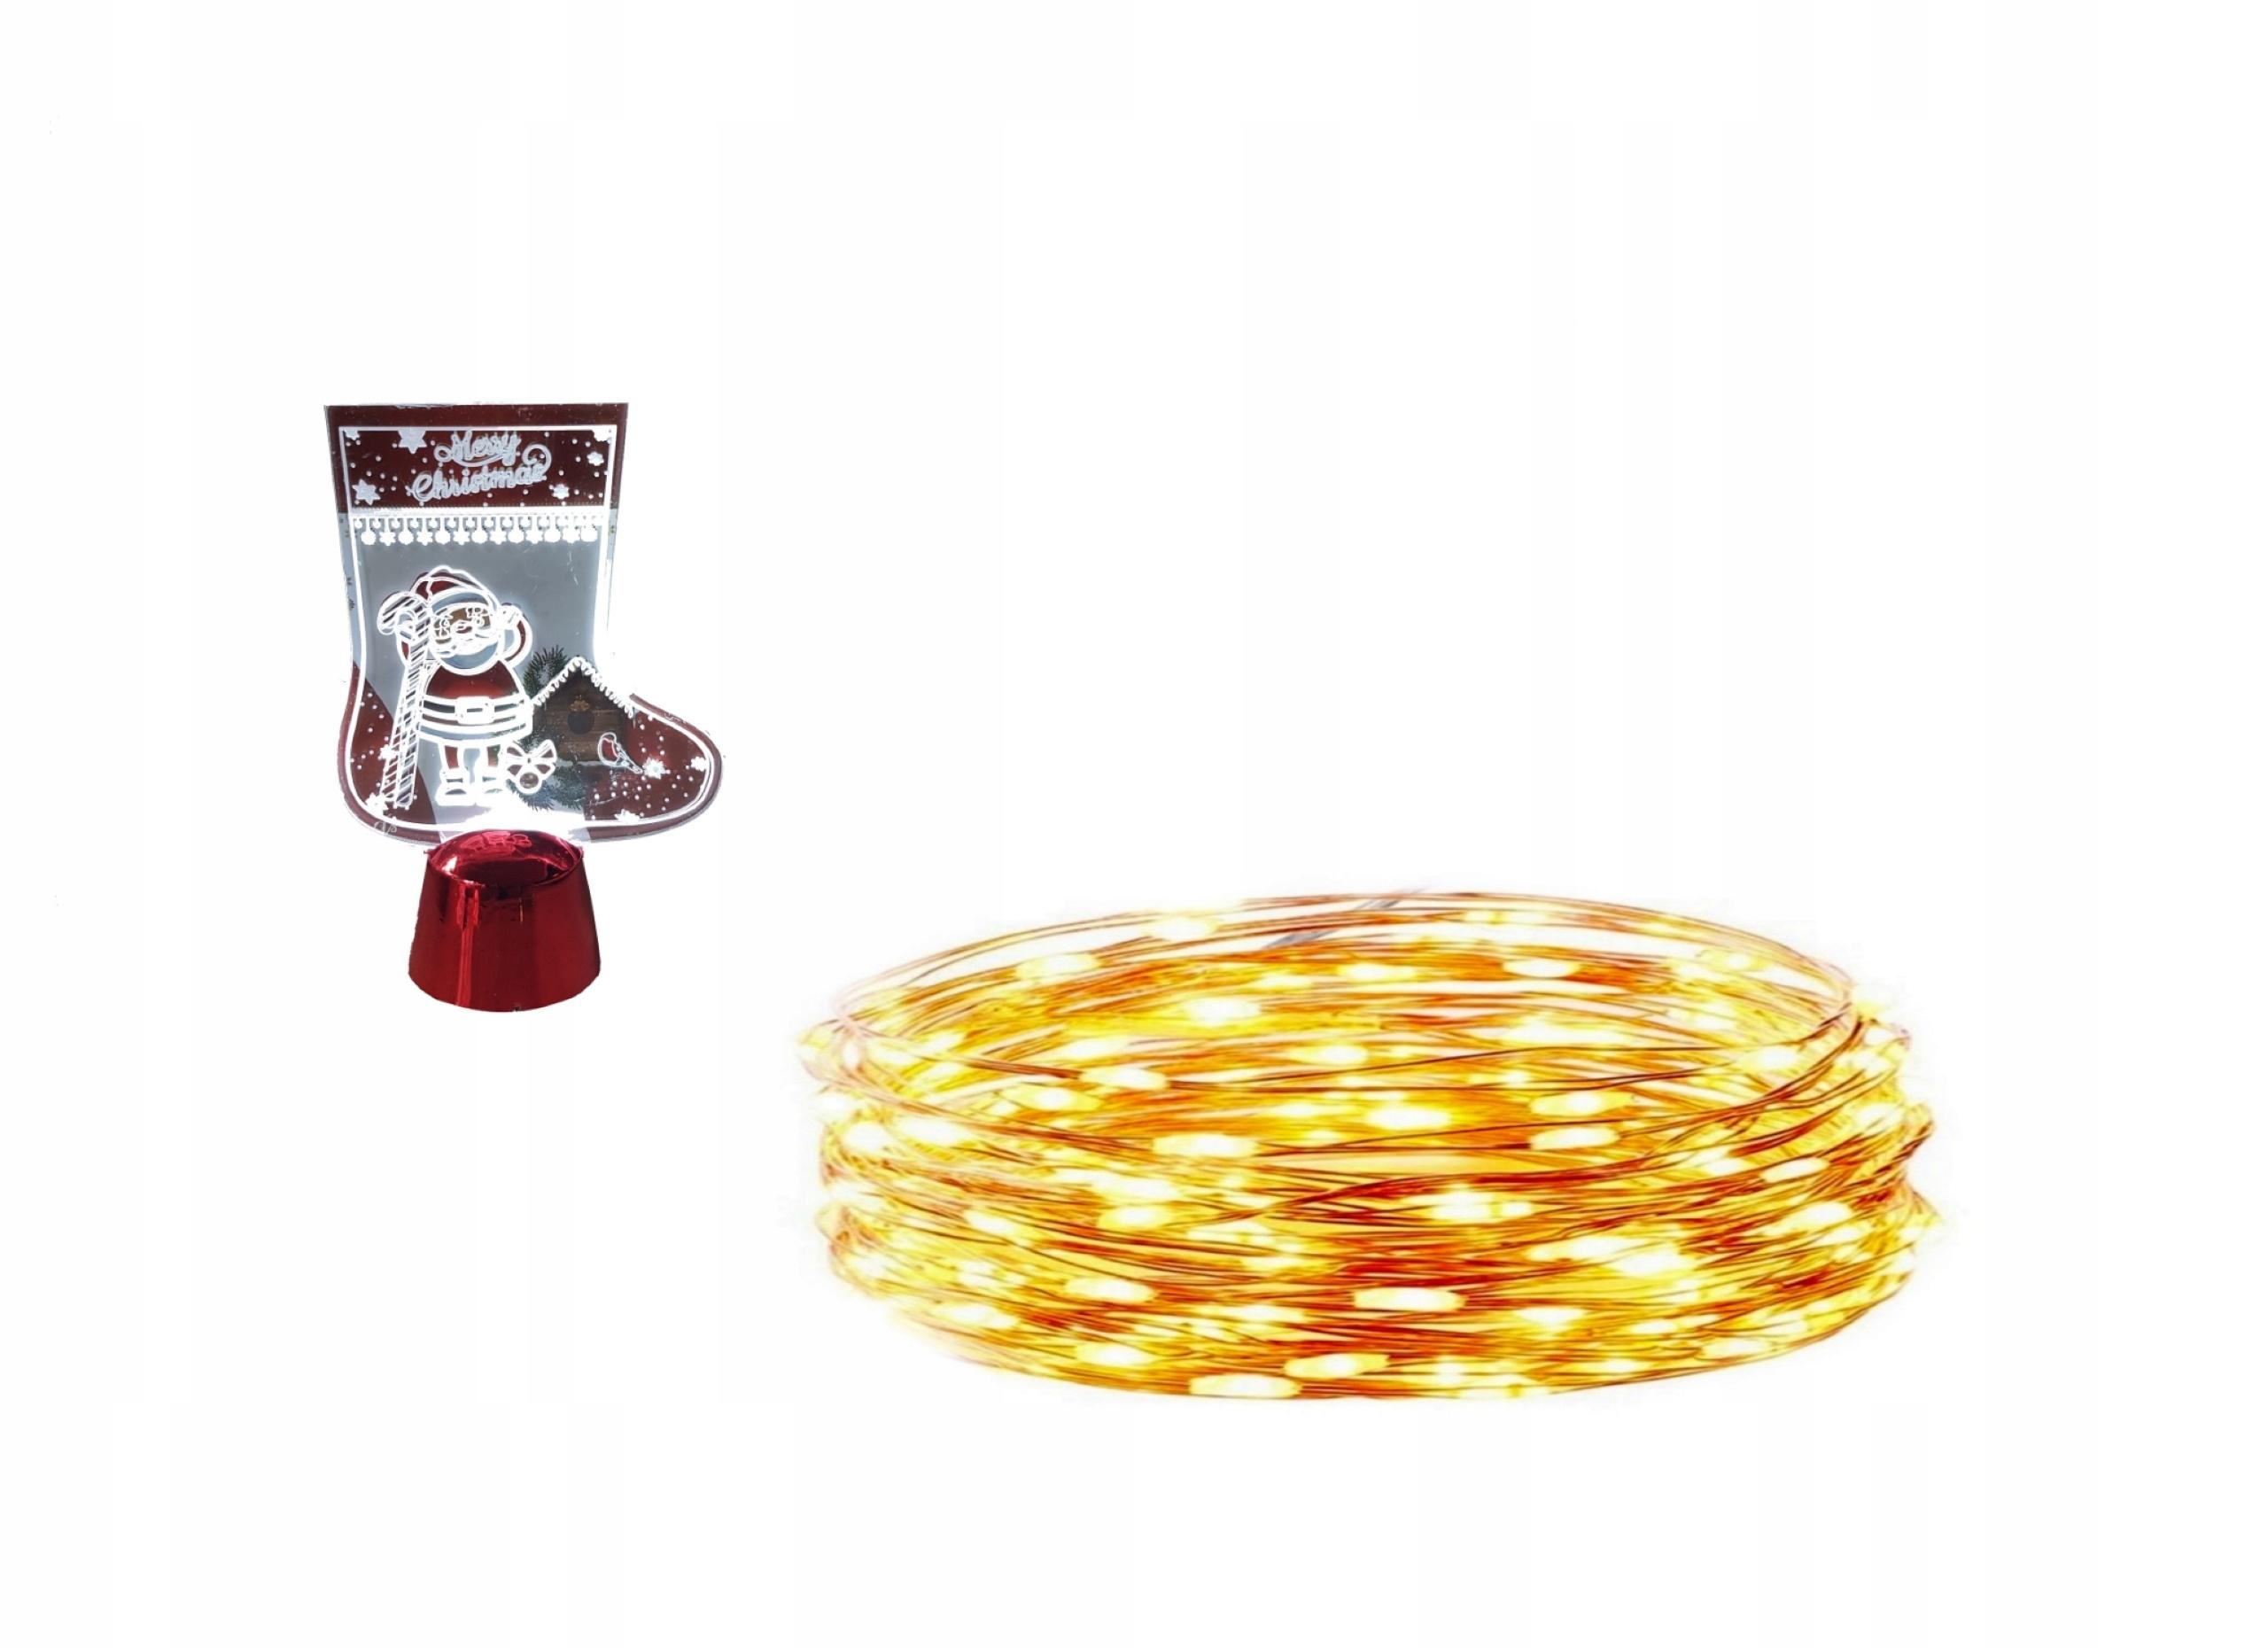 Лампы wiciki 50 LED на батарейках 5м БЕСПЛАТНО